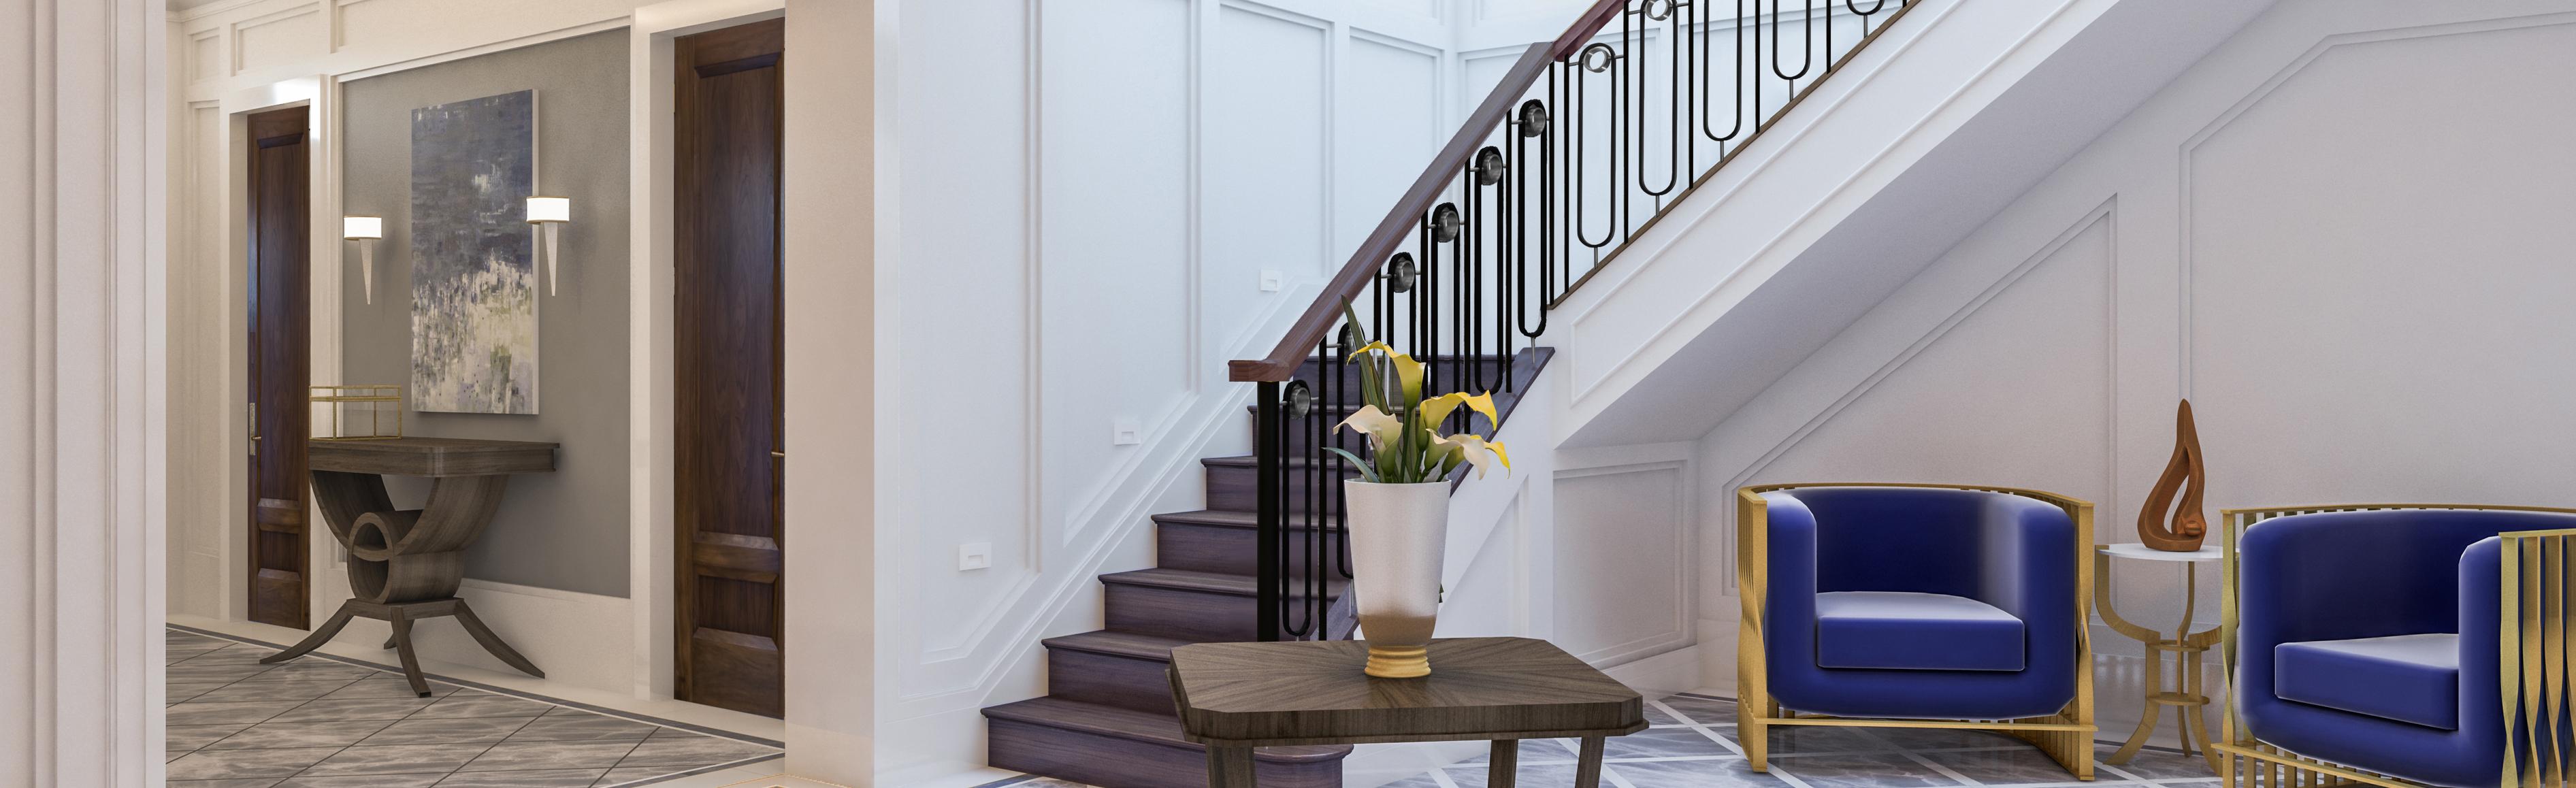 interior design firm vision statement example